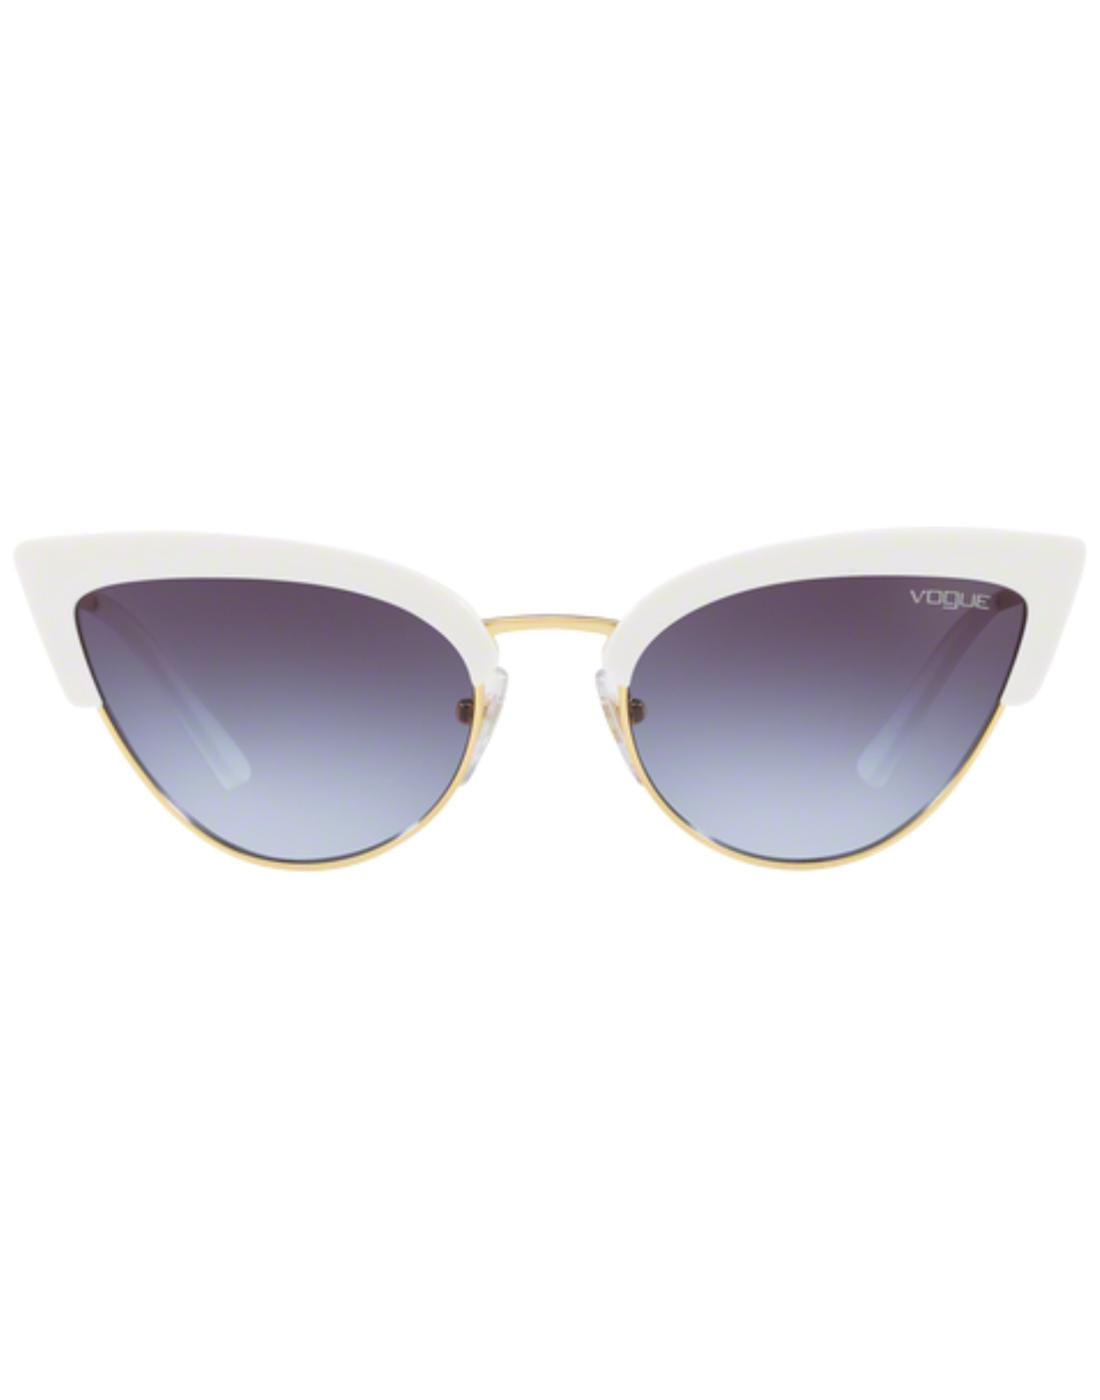 VOGUE Retro 50s Vintage Cats-Eye Sunglasses White